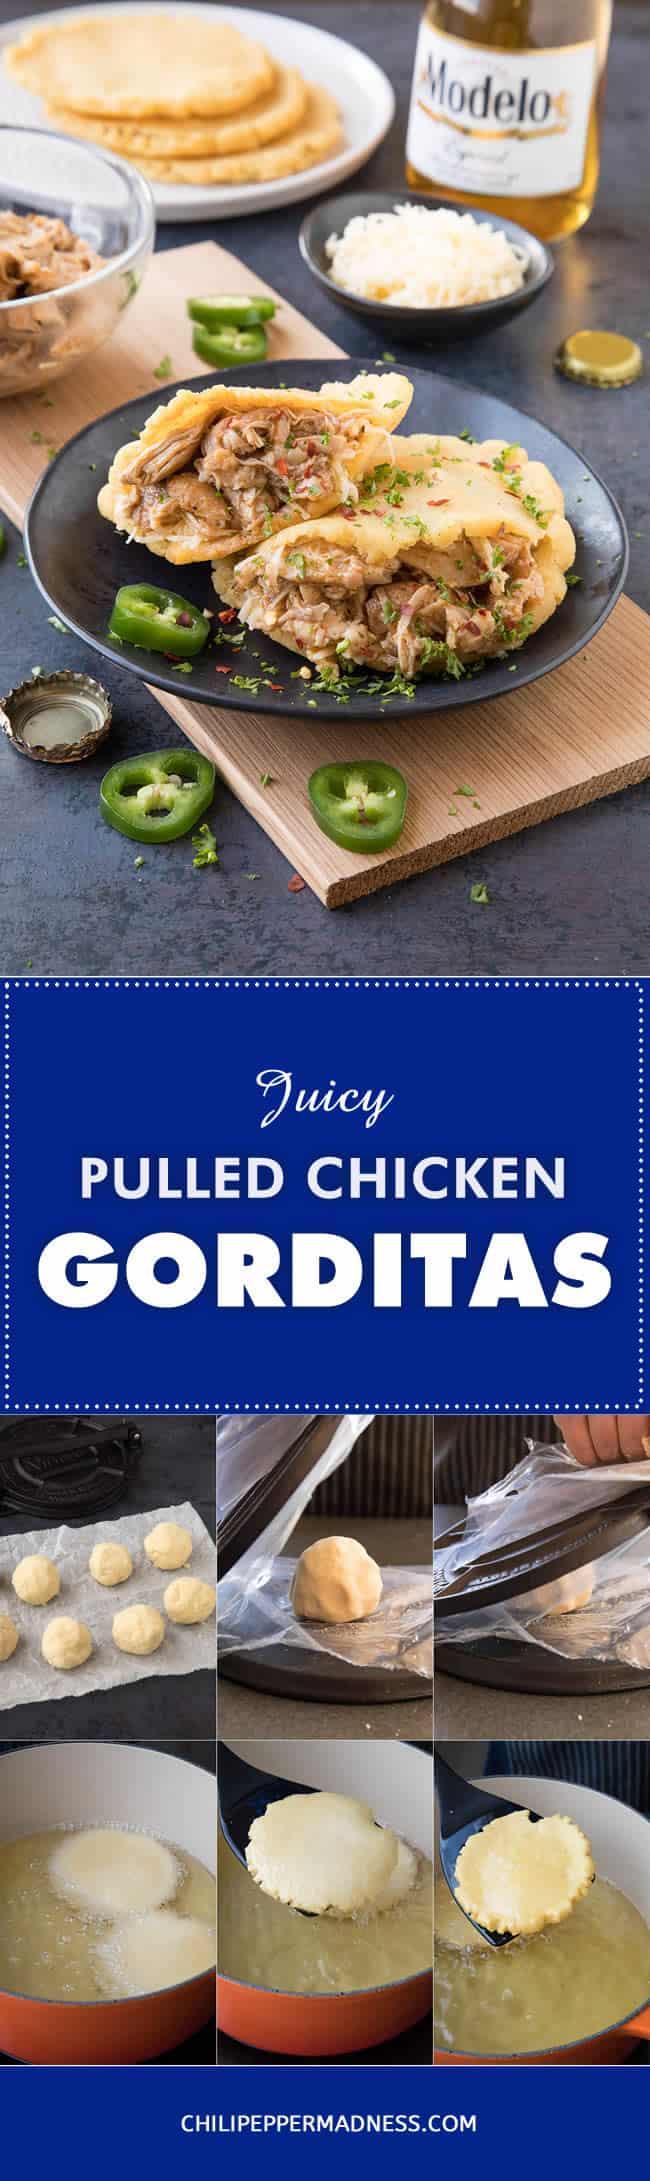 Pulled Chicken Gorditas - Recipe   ChiliPepperMadness.com #gorditas #pulledchicken #MexicanFood #CincodeMayo